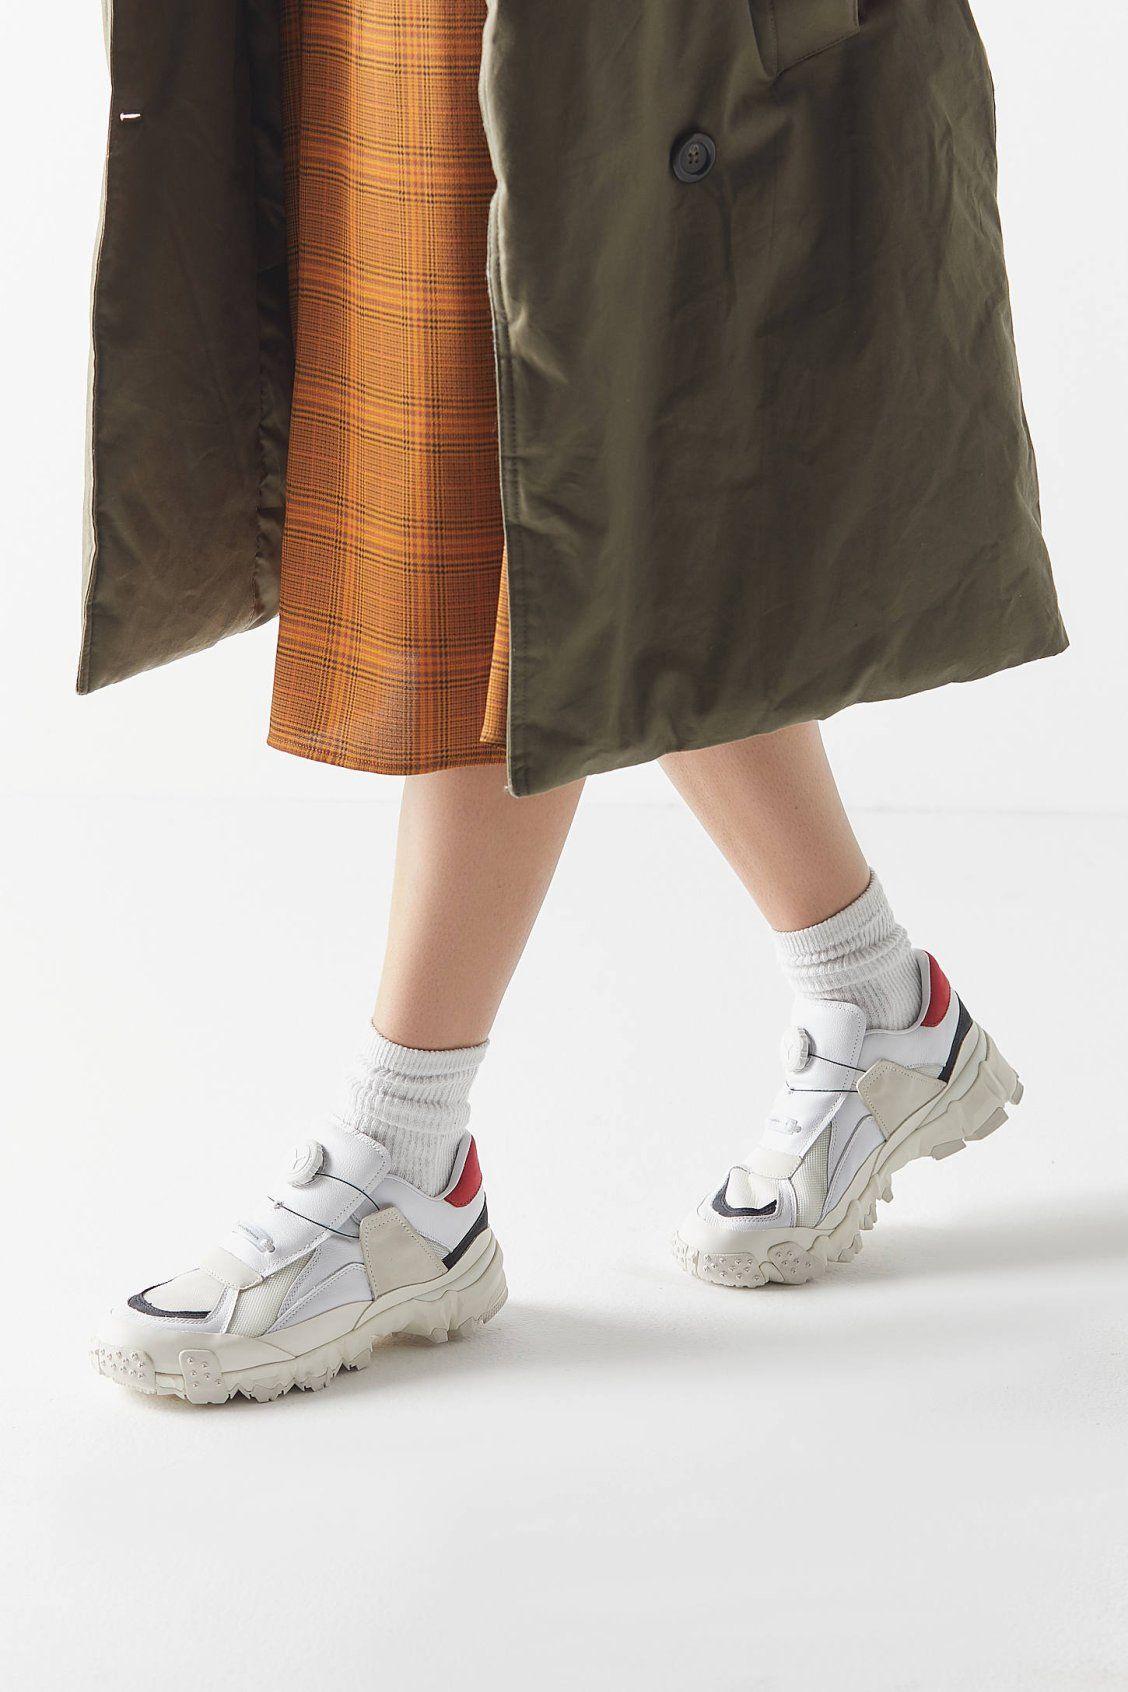 Puma X Han Kjobenhavn Trailfox Disc Sneaker Han Kjobenhavn Sneakers Urban Outfitters Ideas